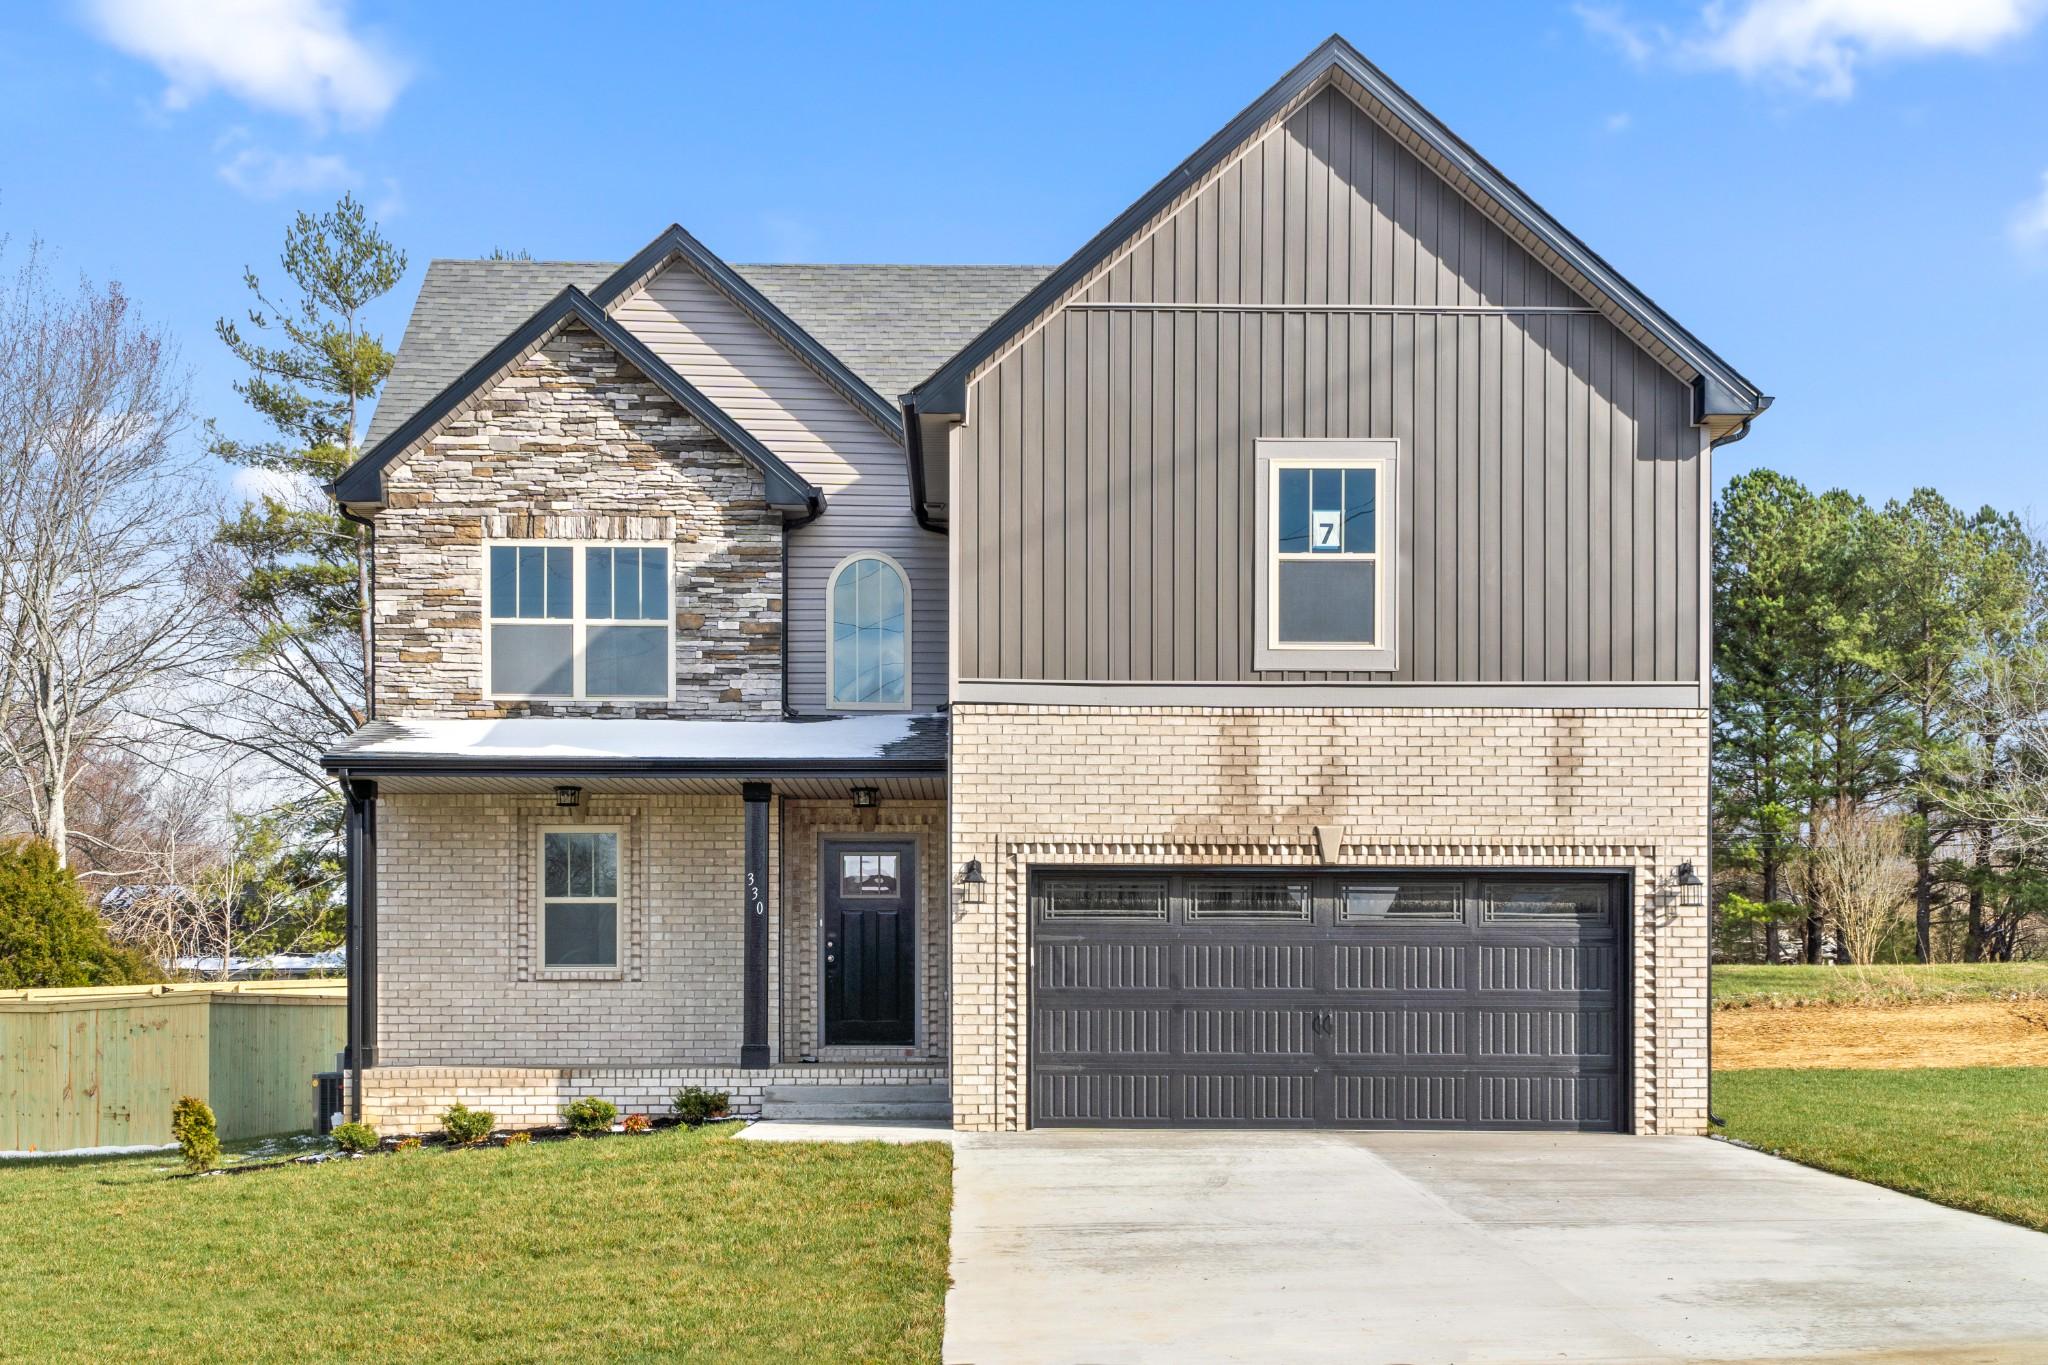 7 Bentley Meadows, Clarksville, TN 37043 - Clarksville, TN real estate listing